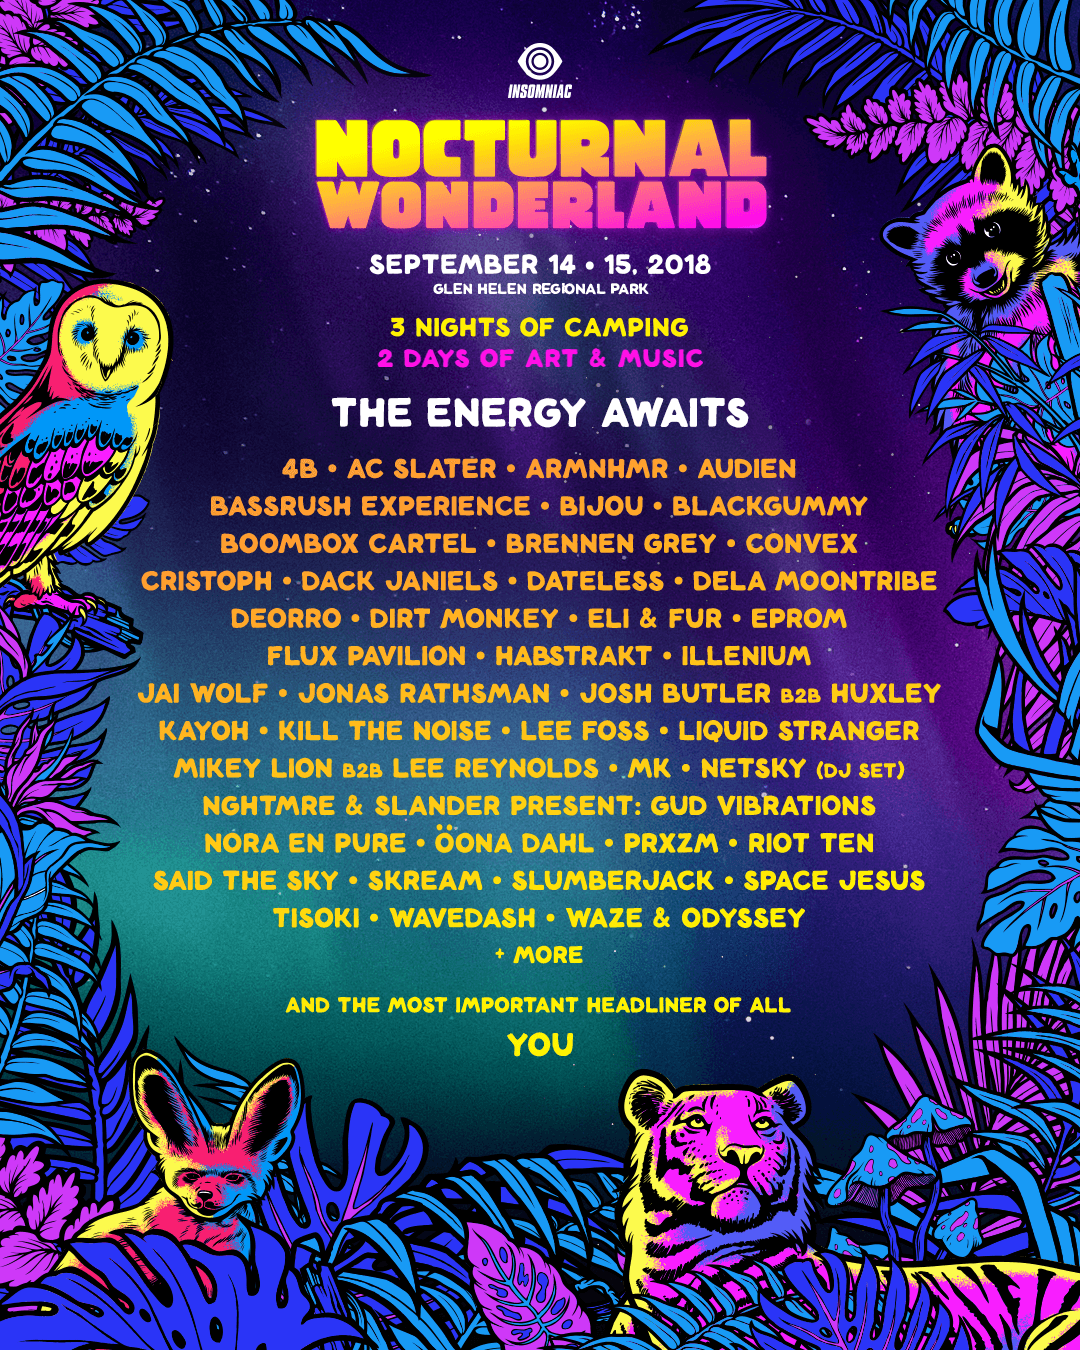 Nocturnal Wonderland 2018 Lineup